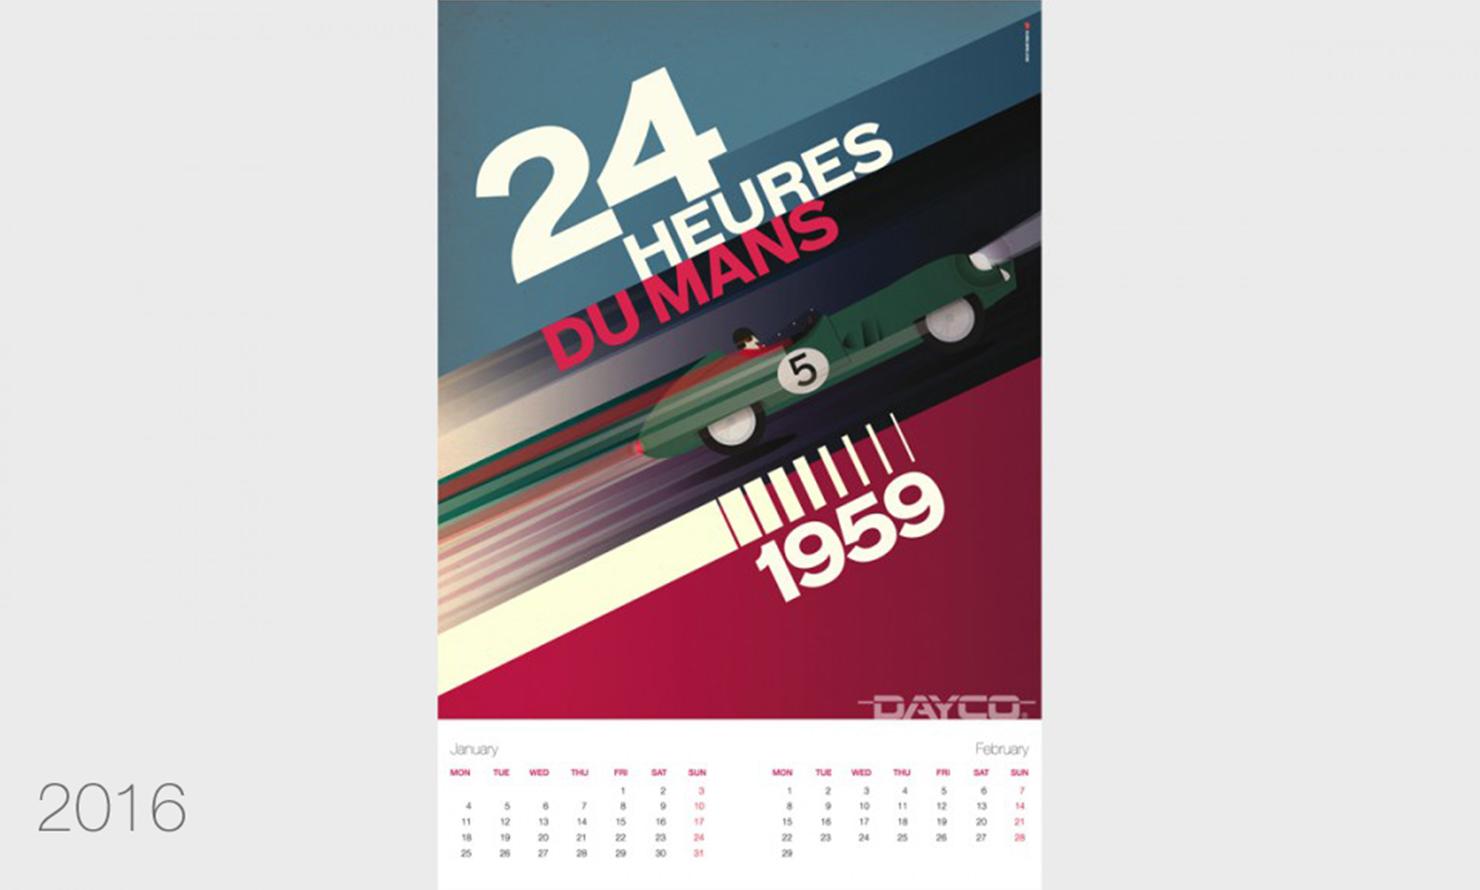 https://kubelibre.com/uploads/Slider-work-tutti-clienti/dayco-calendario-2016-1.jpg